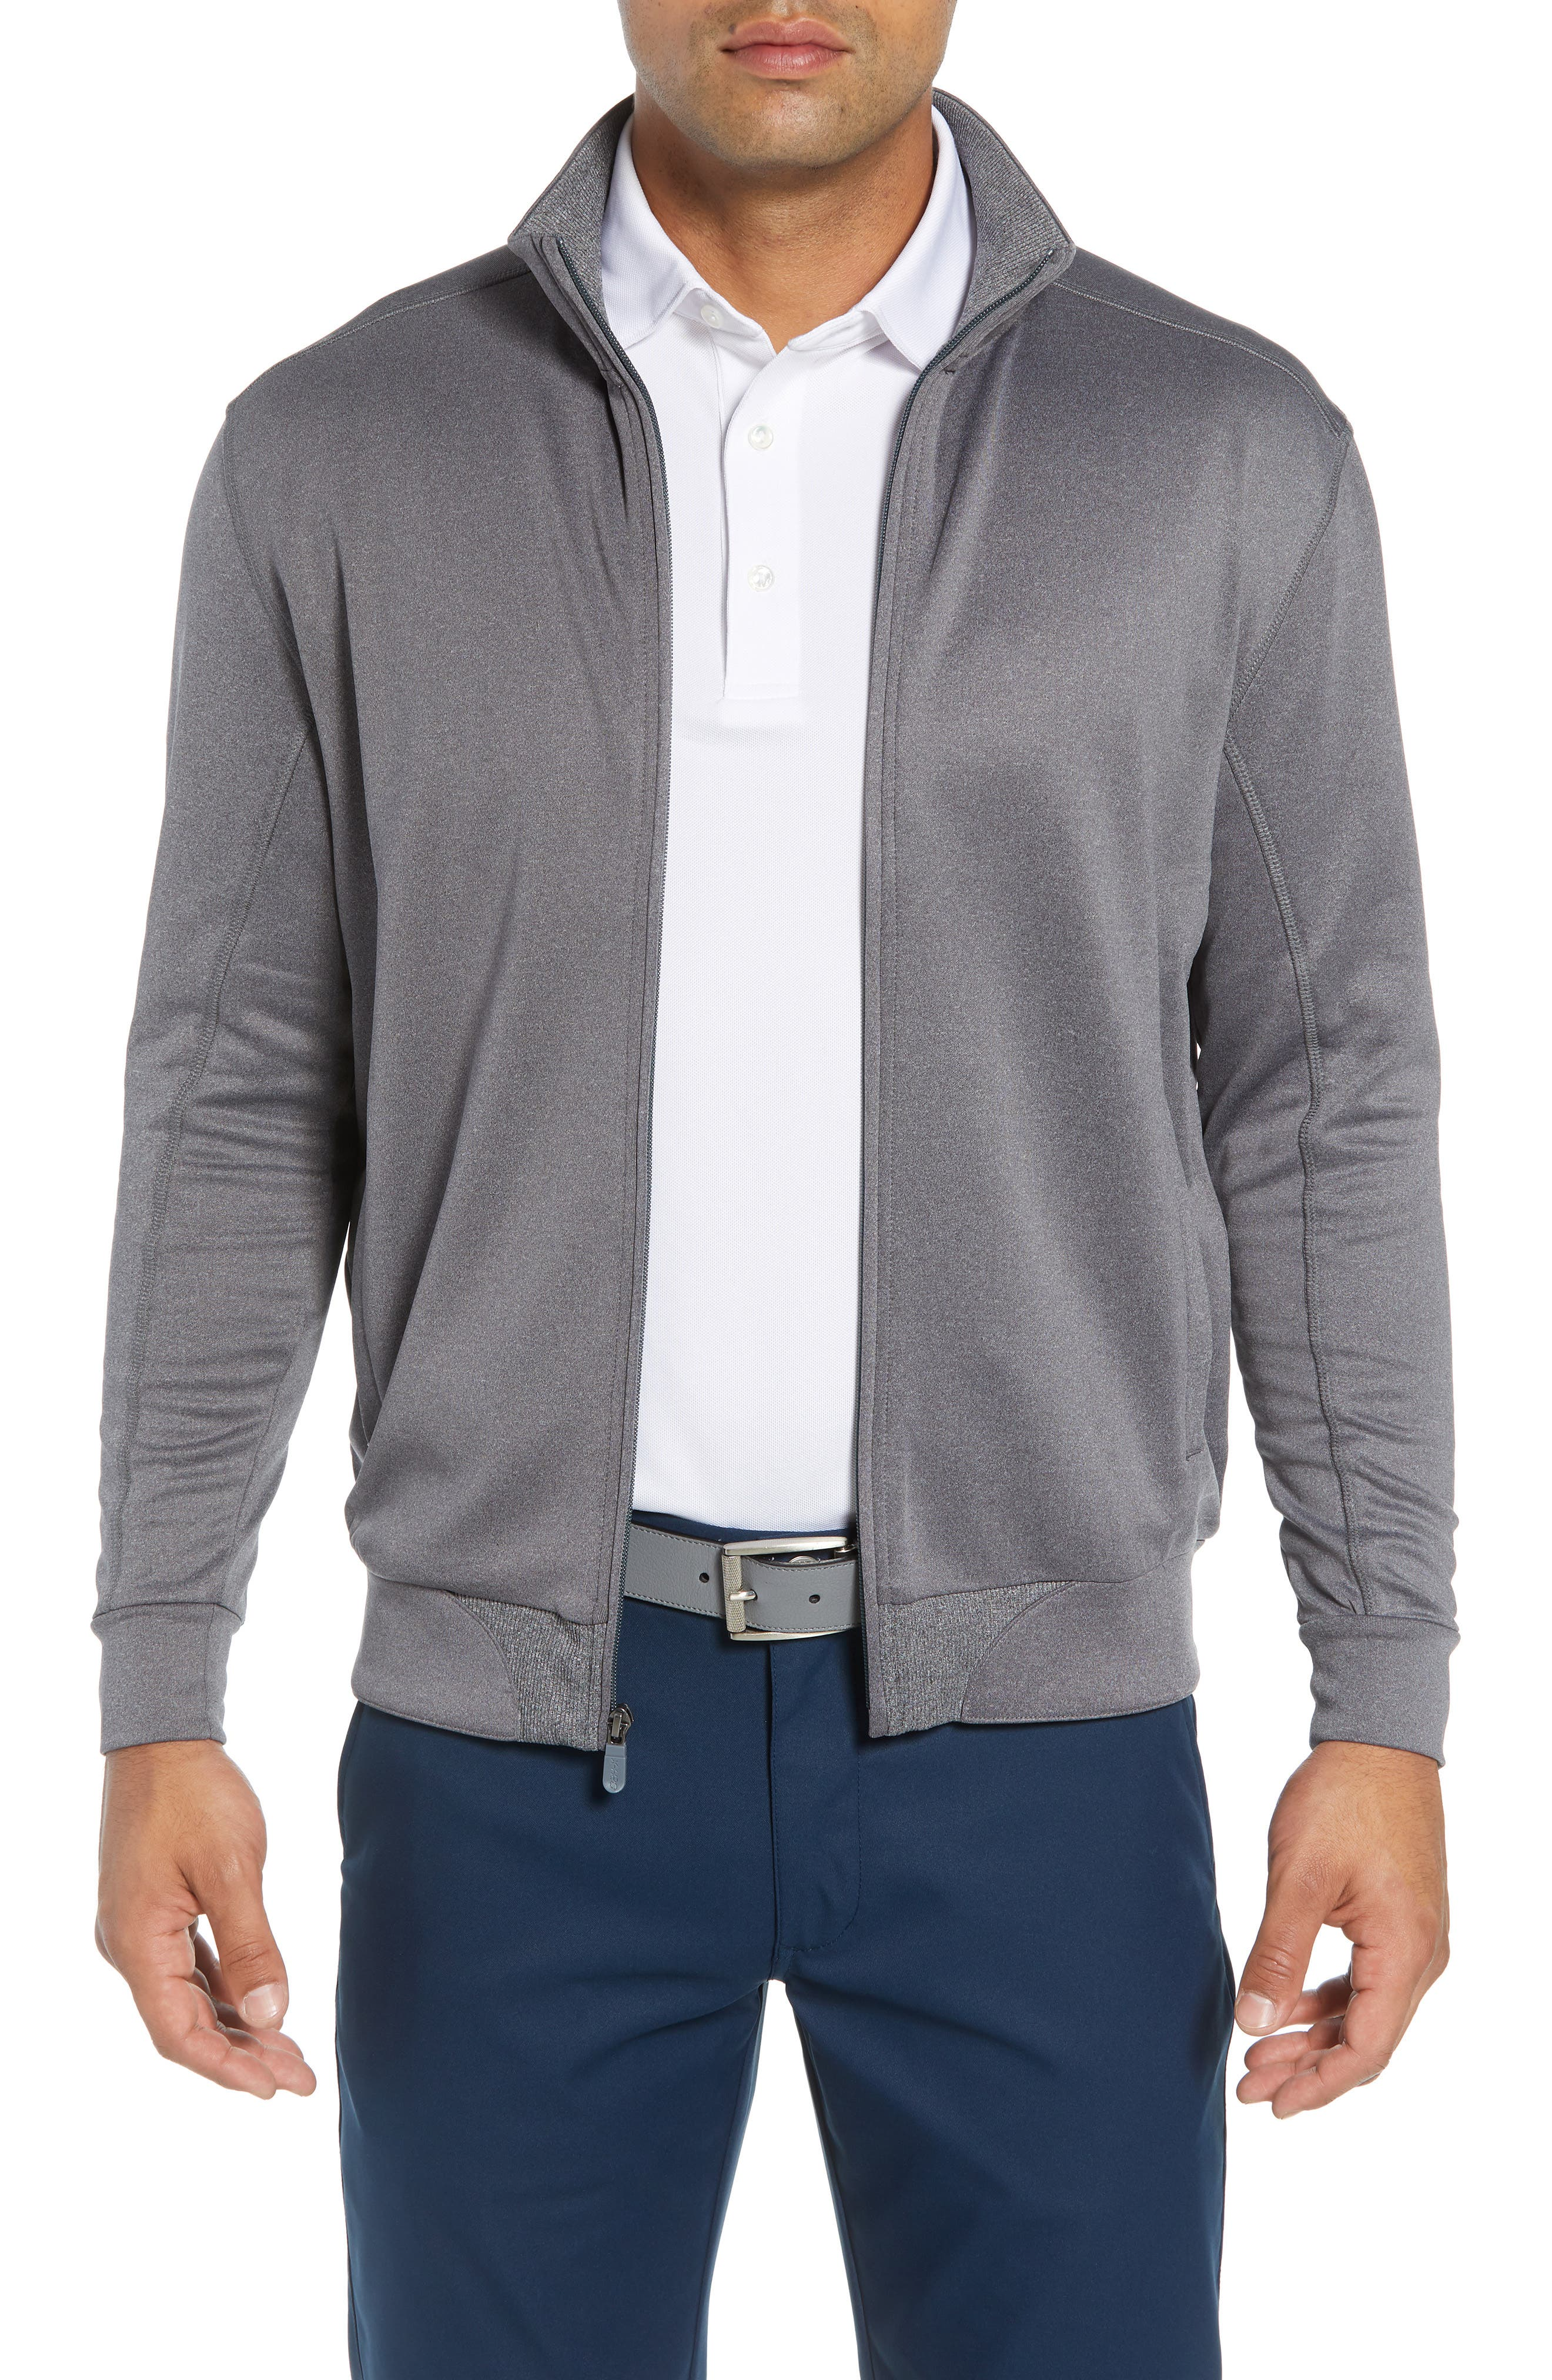 XH20 Denali Performance Jacket,                         Main,                         color, GRAPHITE